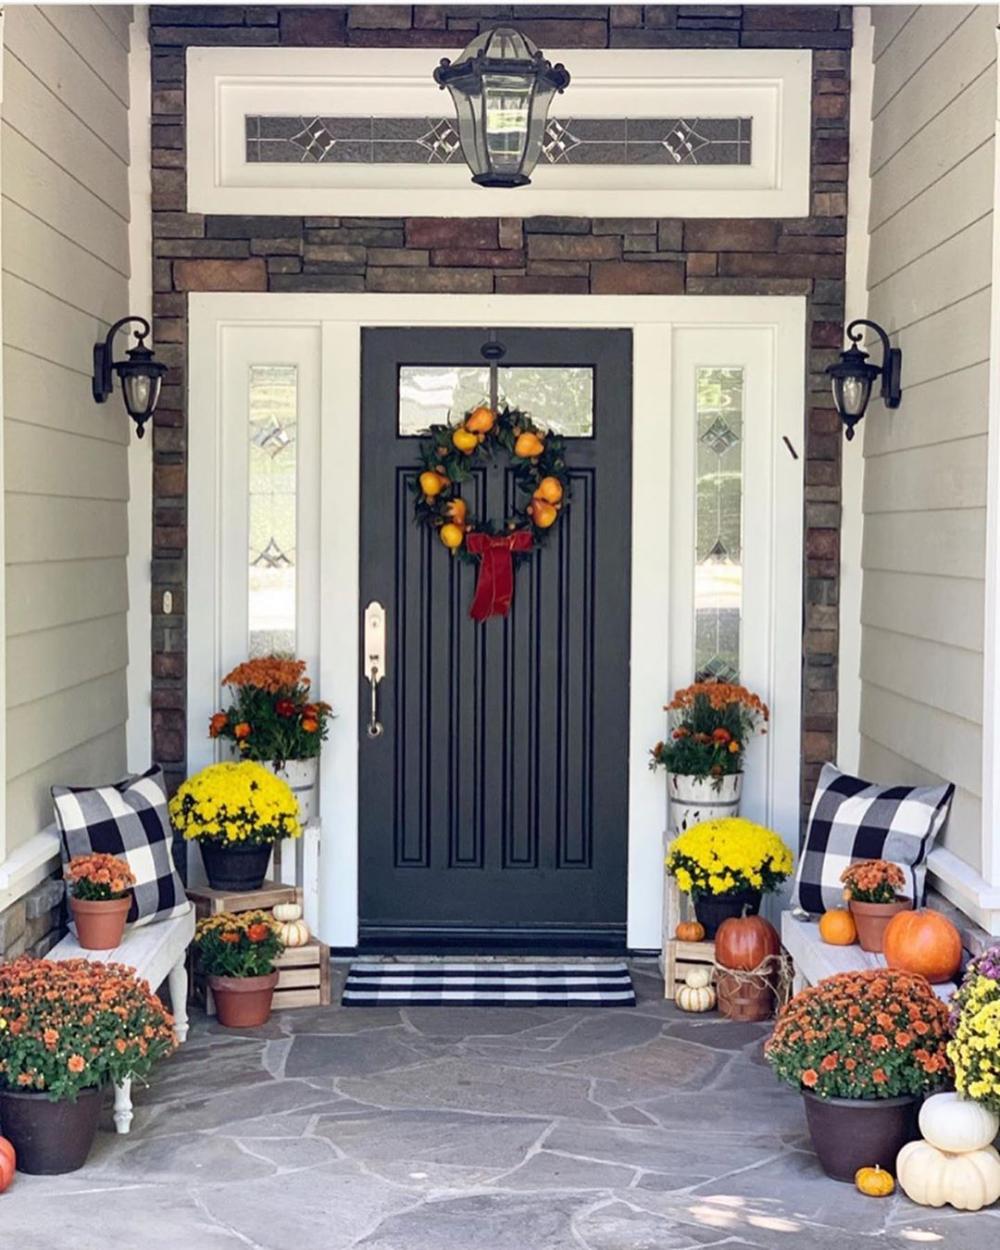 Modern Farmhouse Decor & DIY black door with white trim